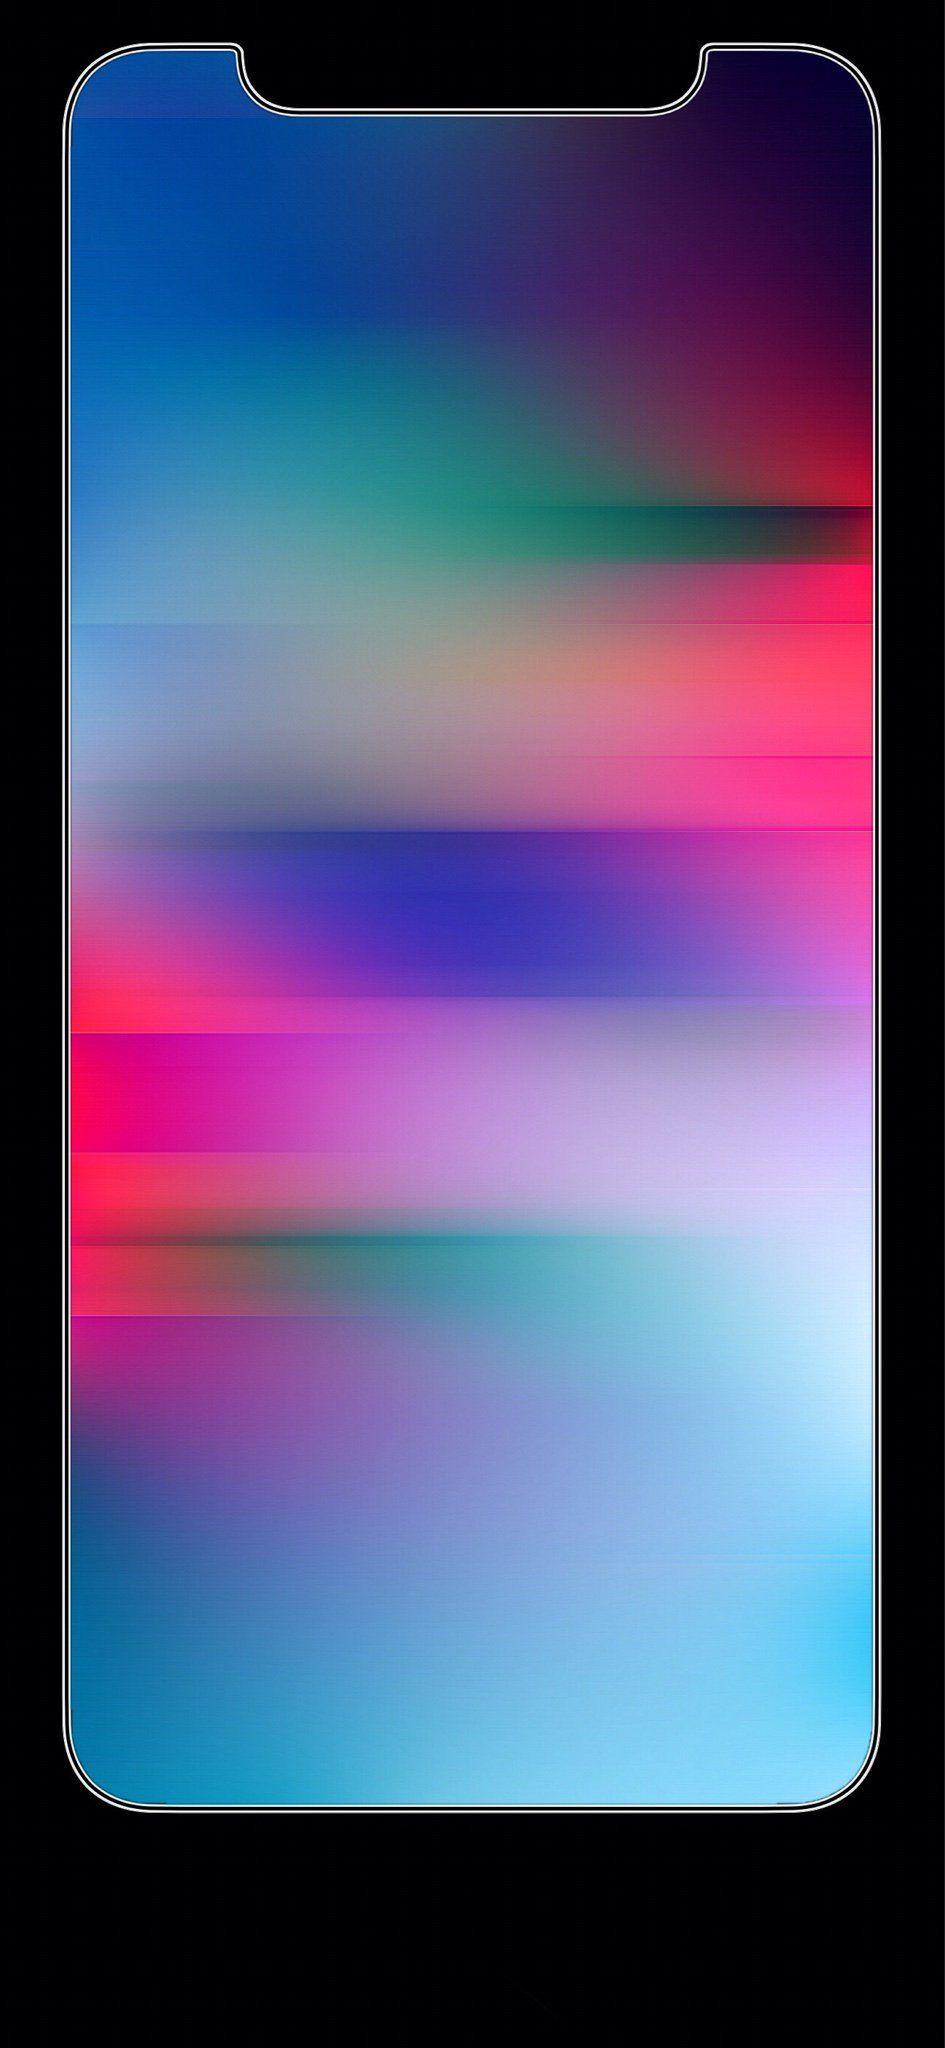 The Iphone X Wallpaper Thread Page 48 Iphone Ipad Ipod